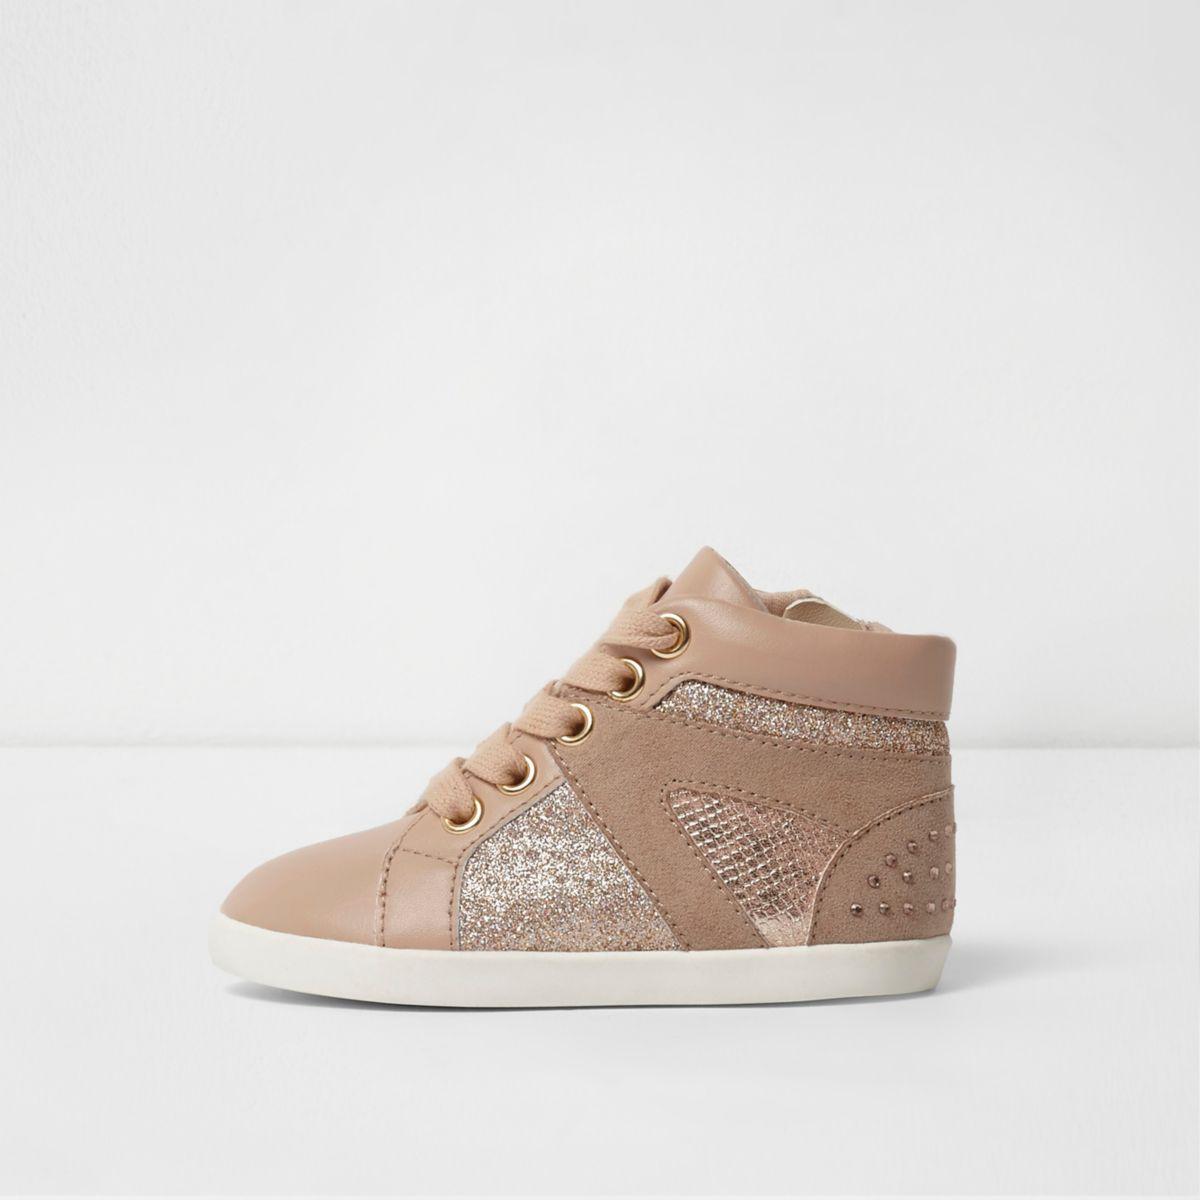 Pinke, glitzernde Sneakers